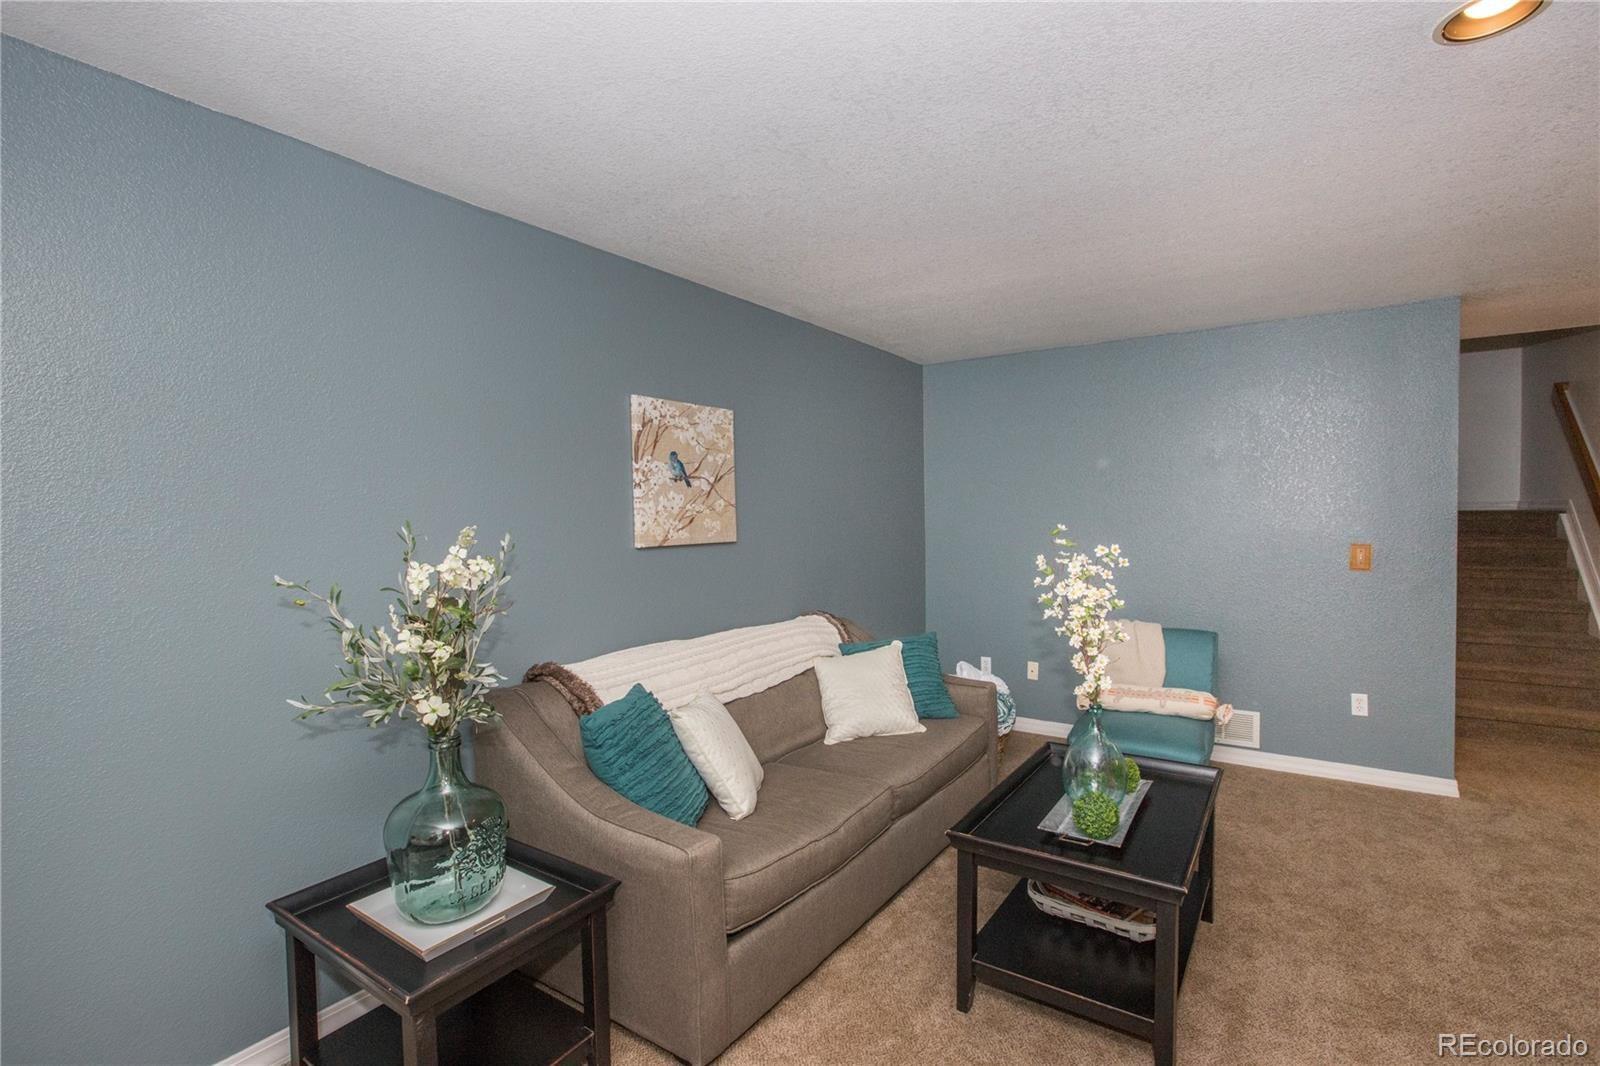 MLS# 3758449 - 11 - 6802 Antigua Drive #26, Fort Collins, CO 80525